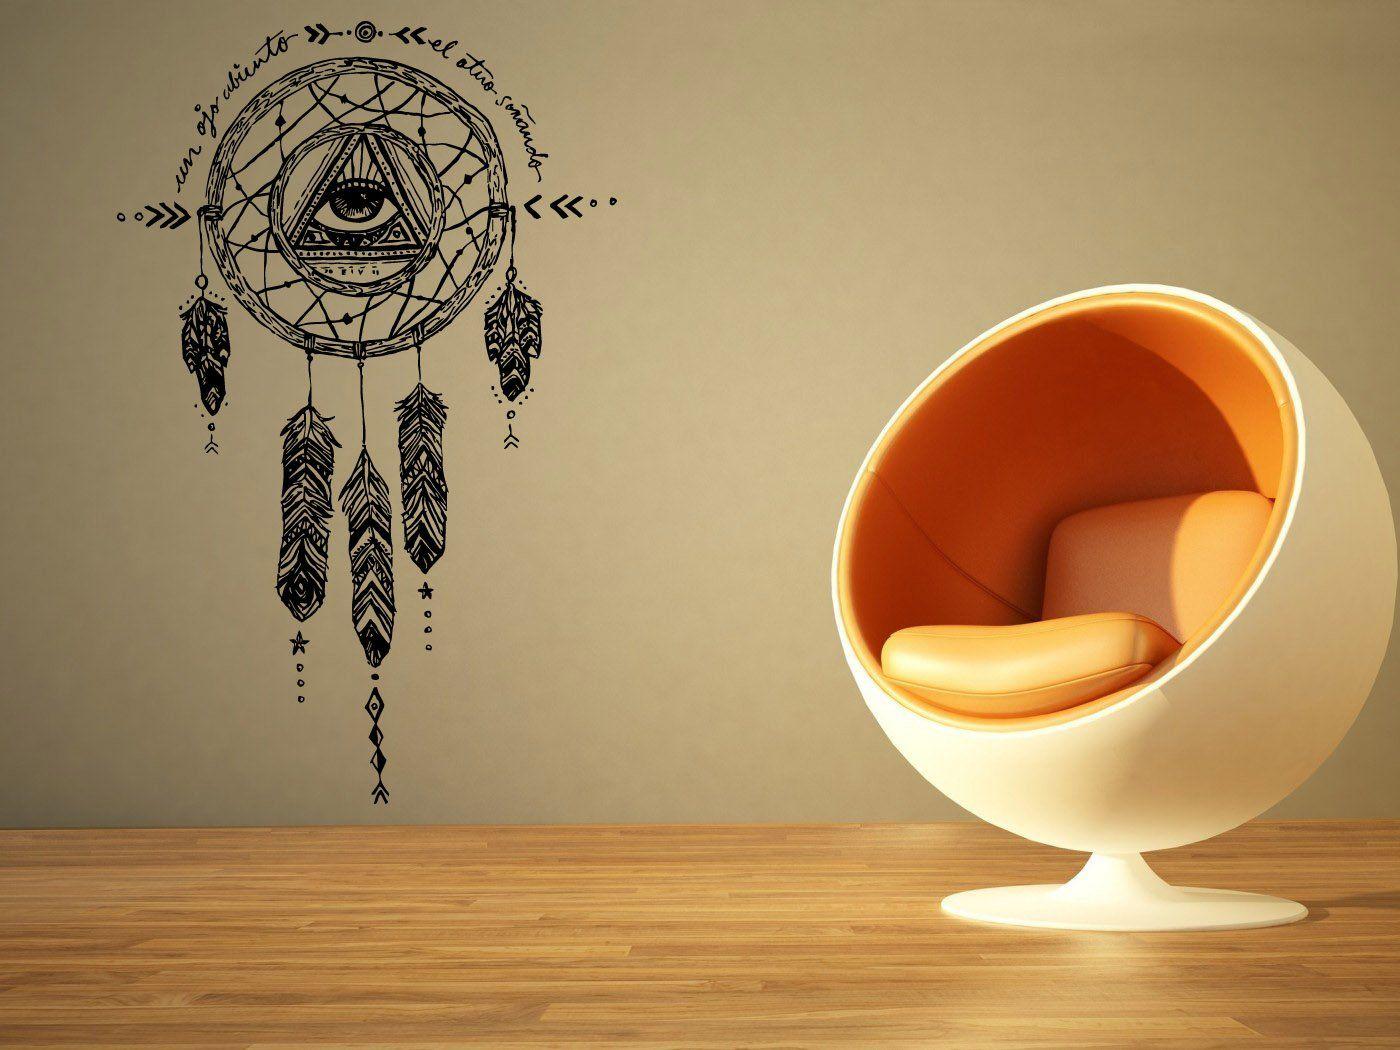 Wall Room Decor Art Vinyl Sticker Mural Decal Shiva Indian God Big ...